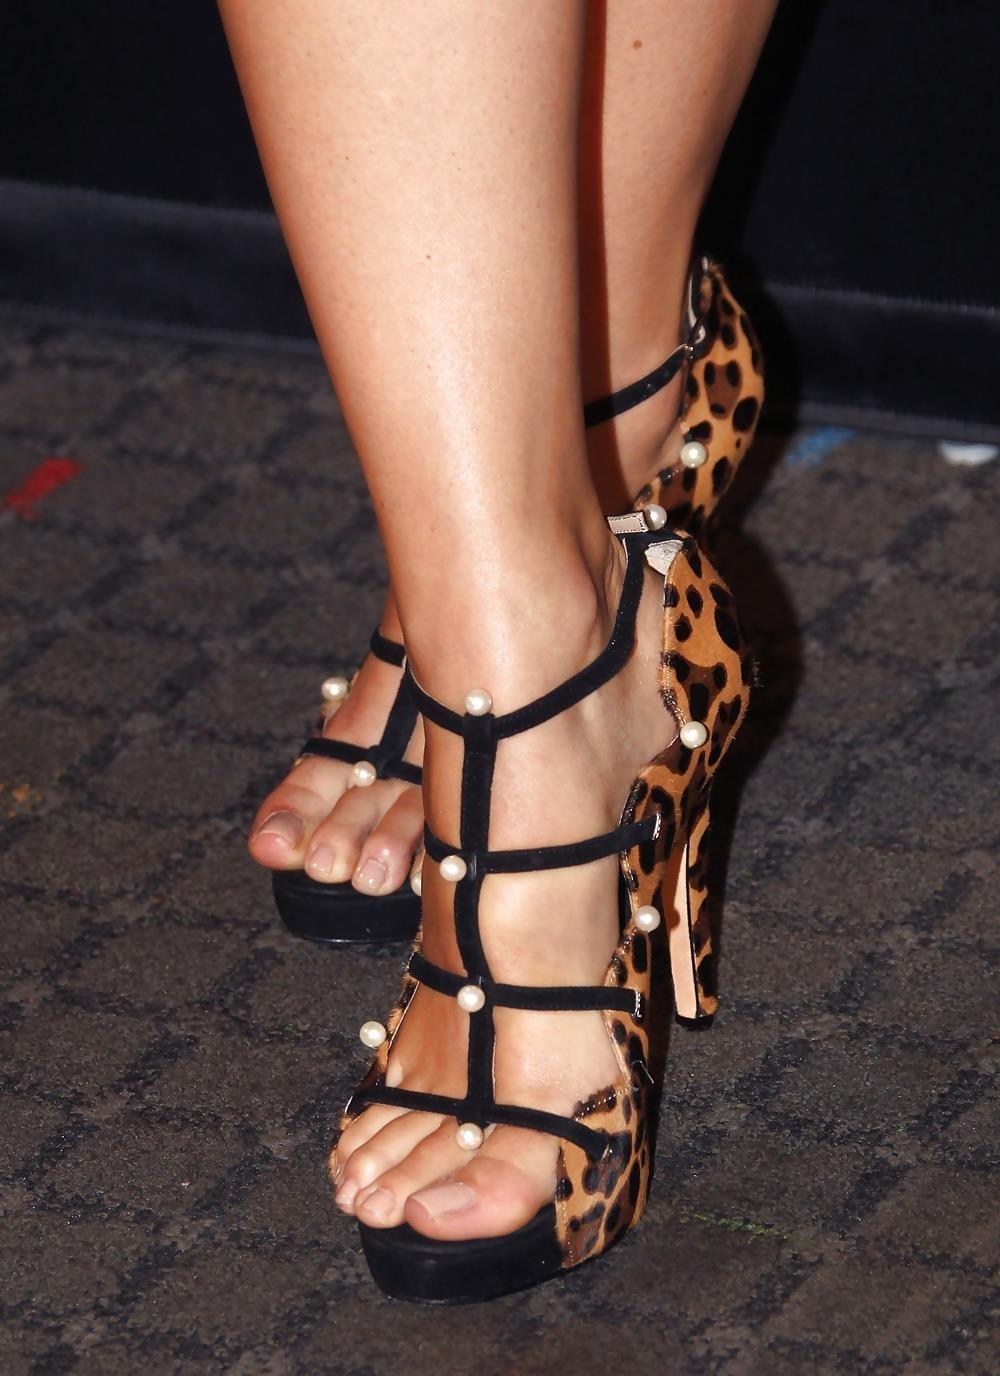 Ebony feet hd-9471